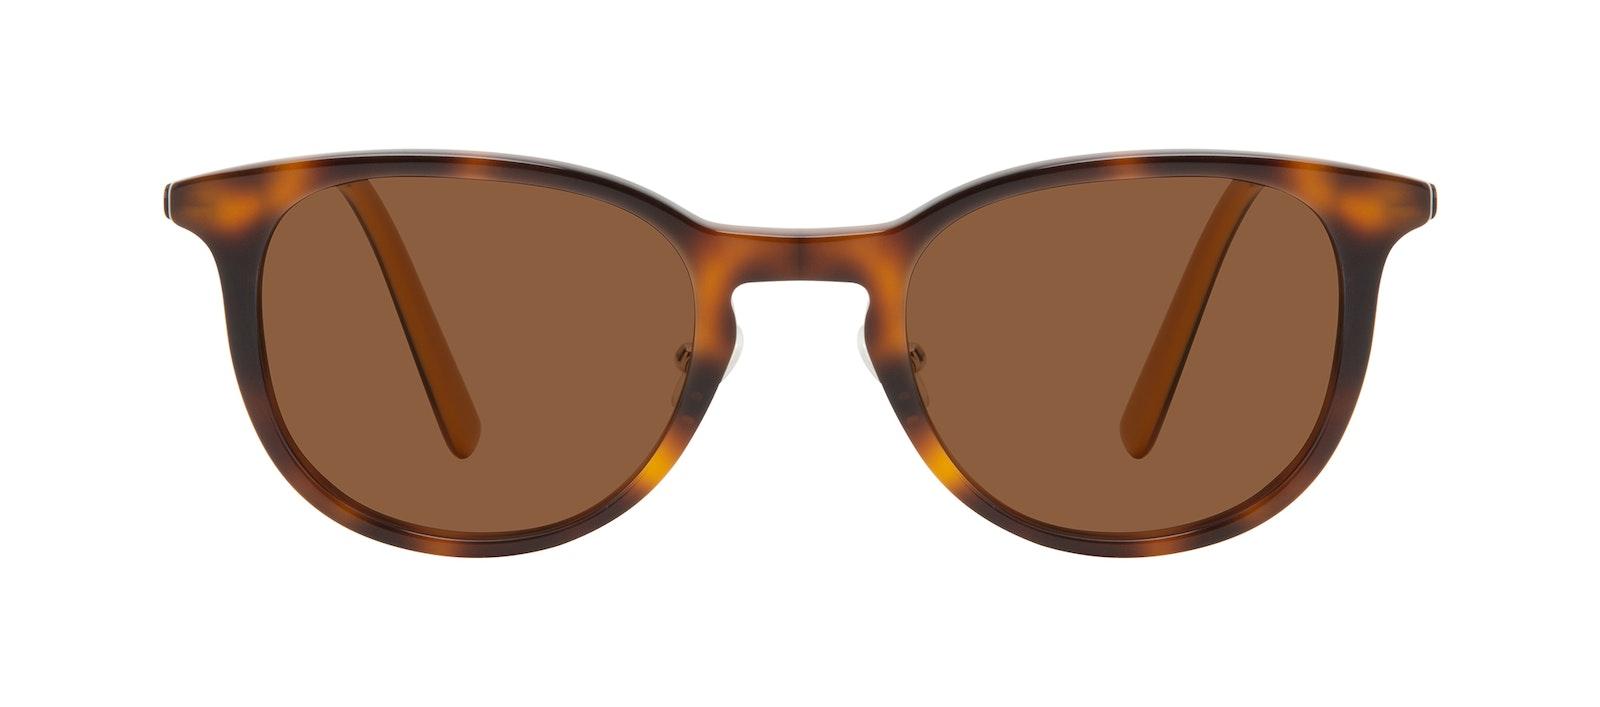 Affordable Fashion Glasses Round Sunglasses Men Coast Tortoise Front